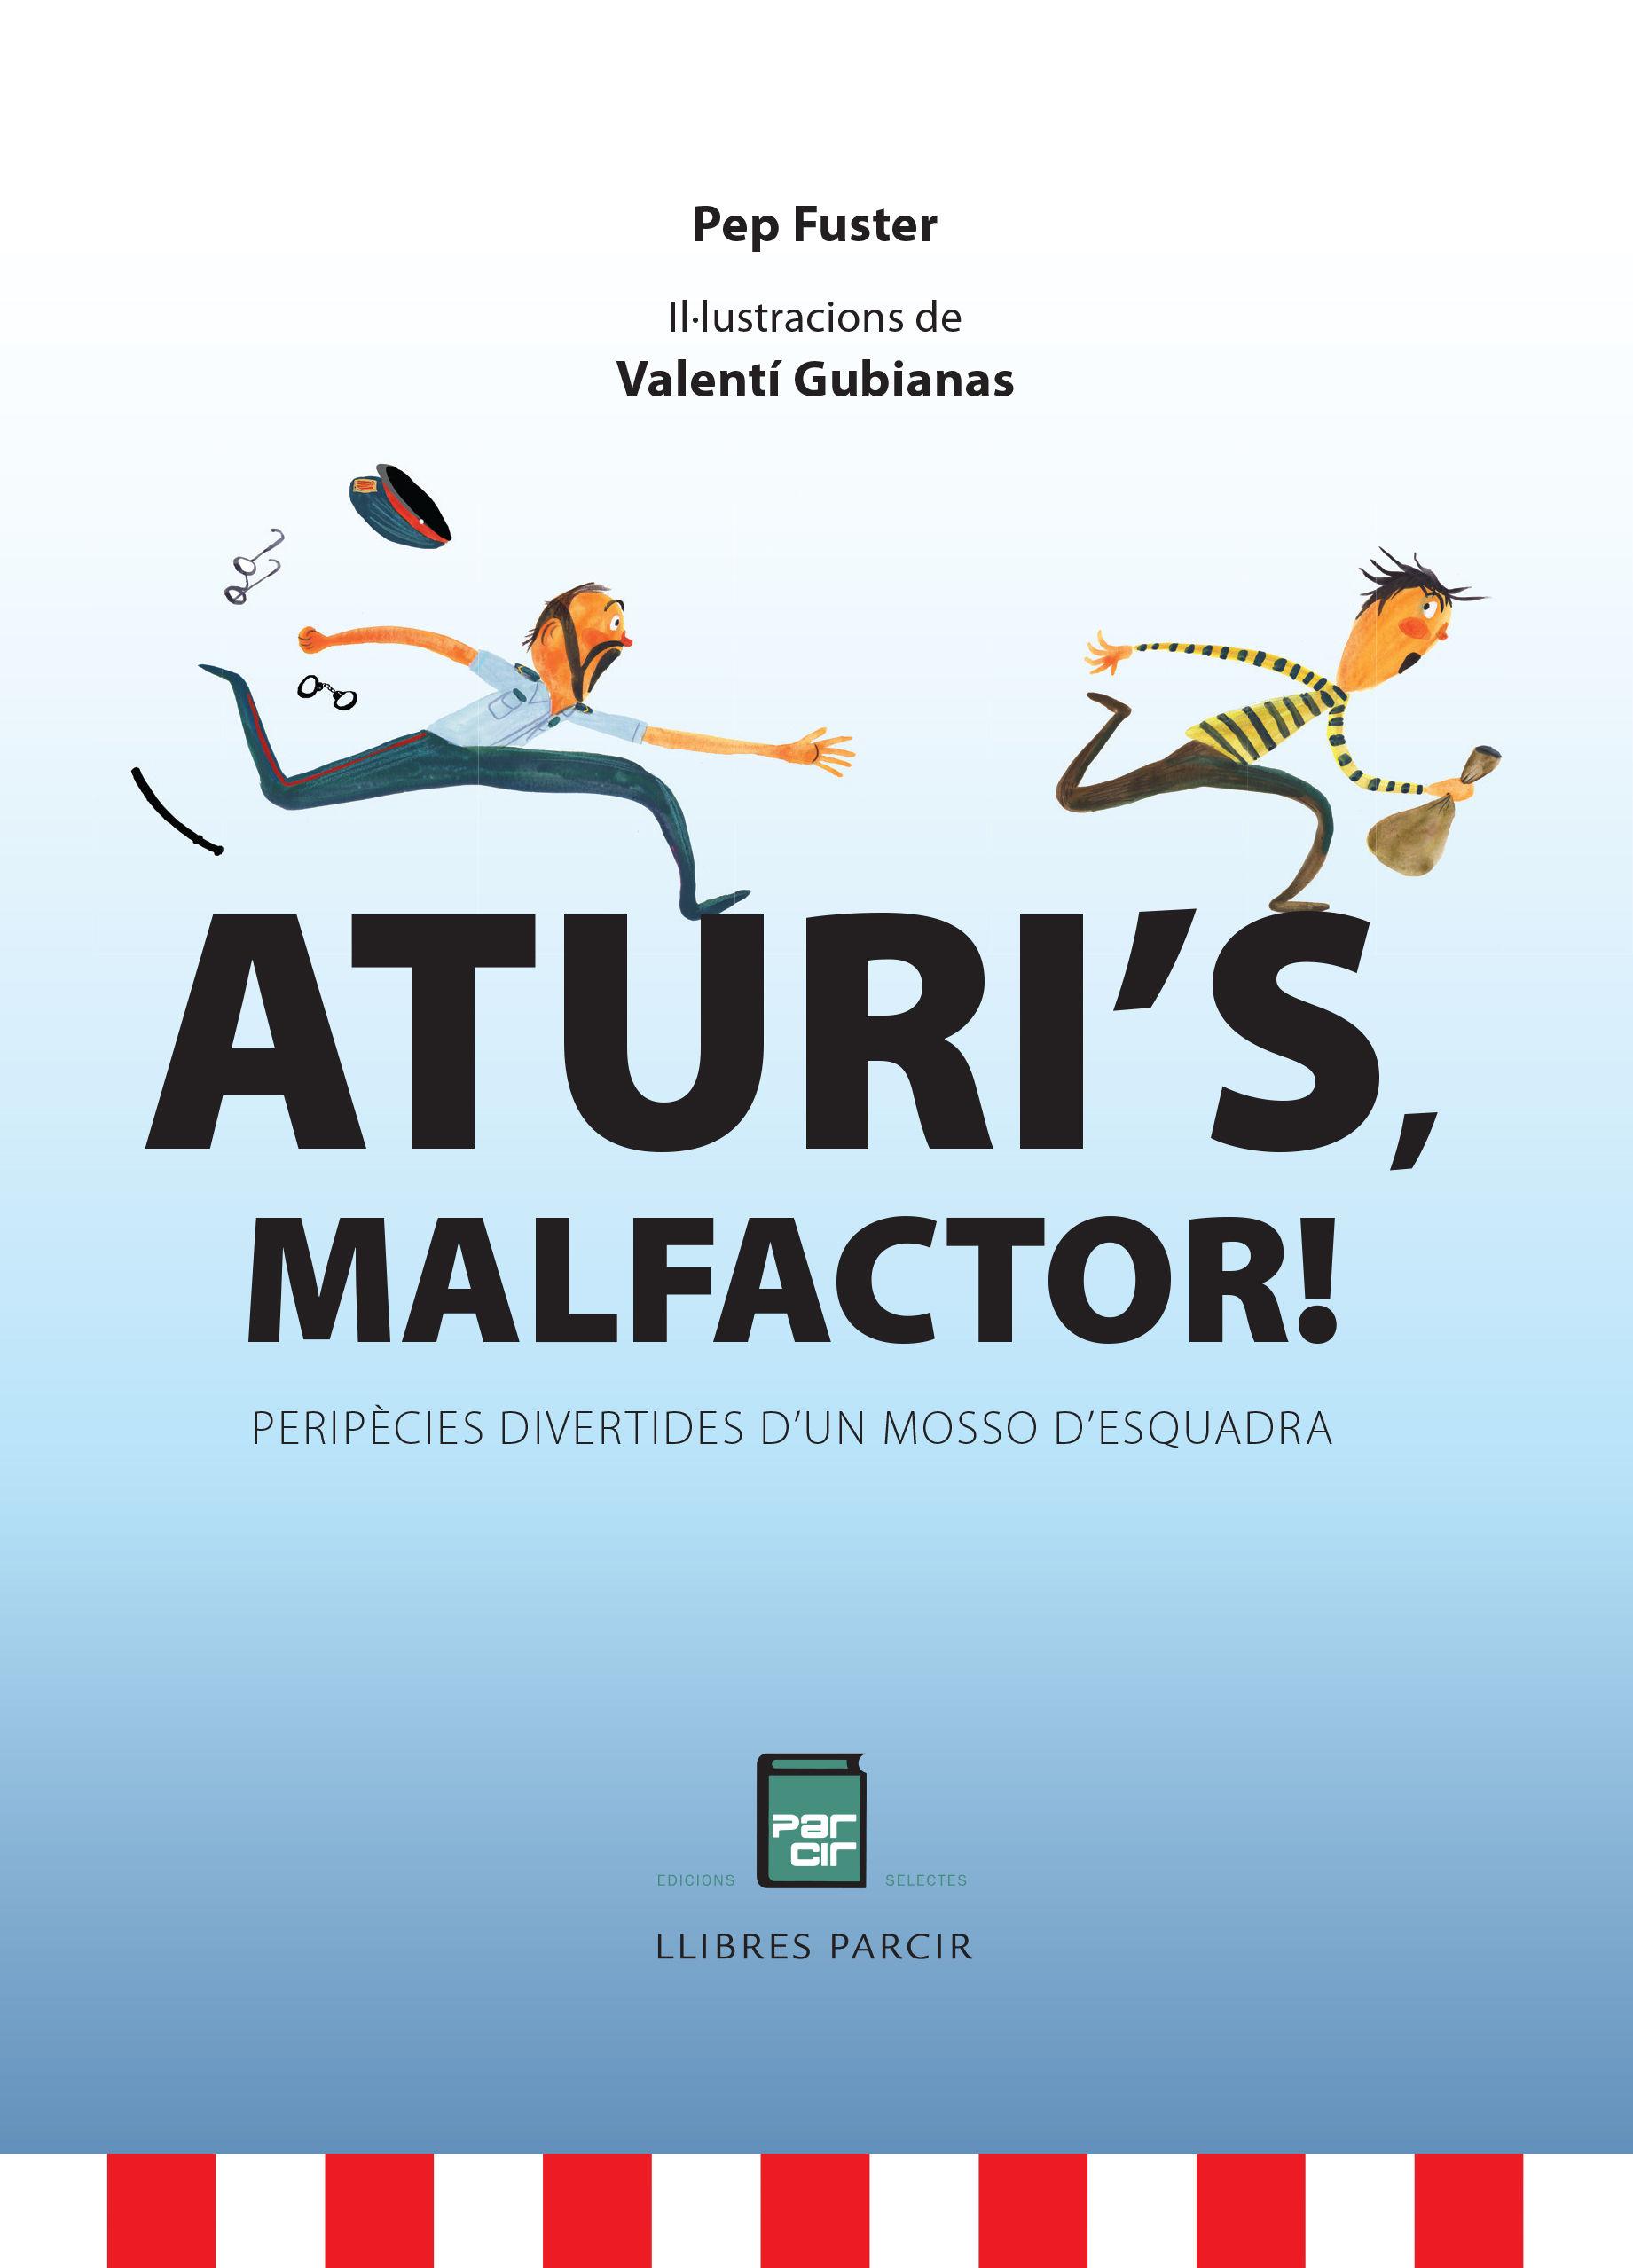 ATURI'S MALFACTOR!